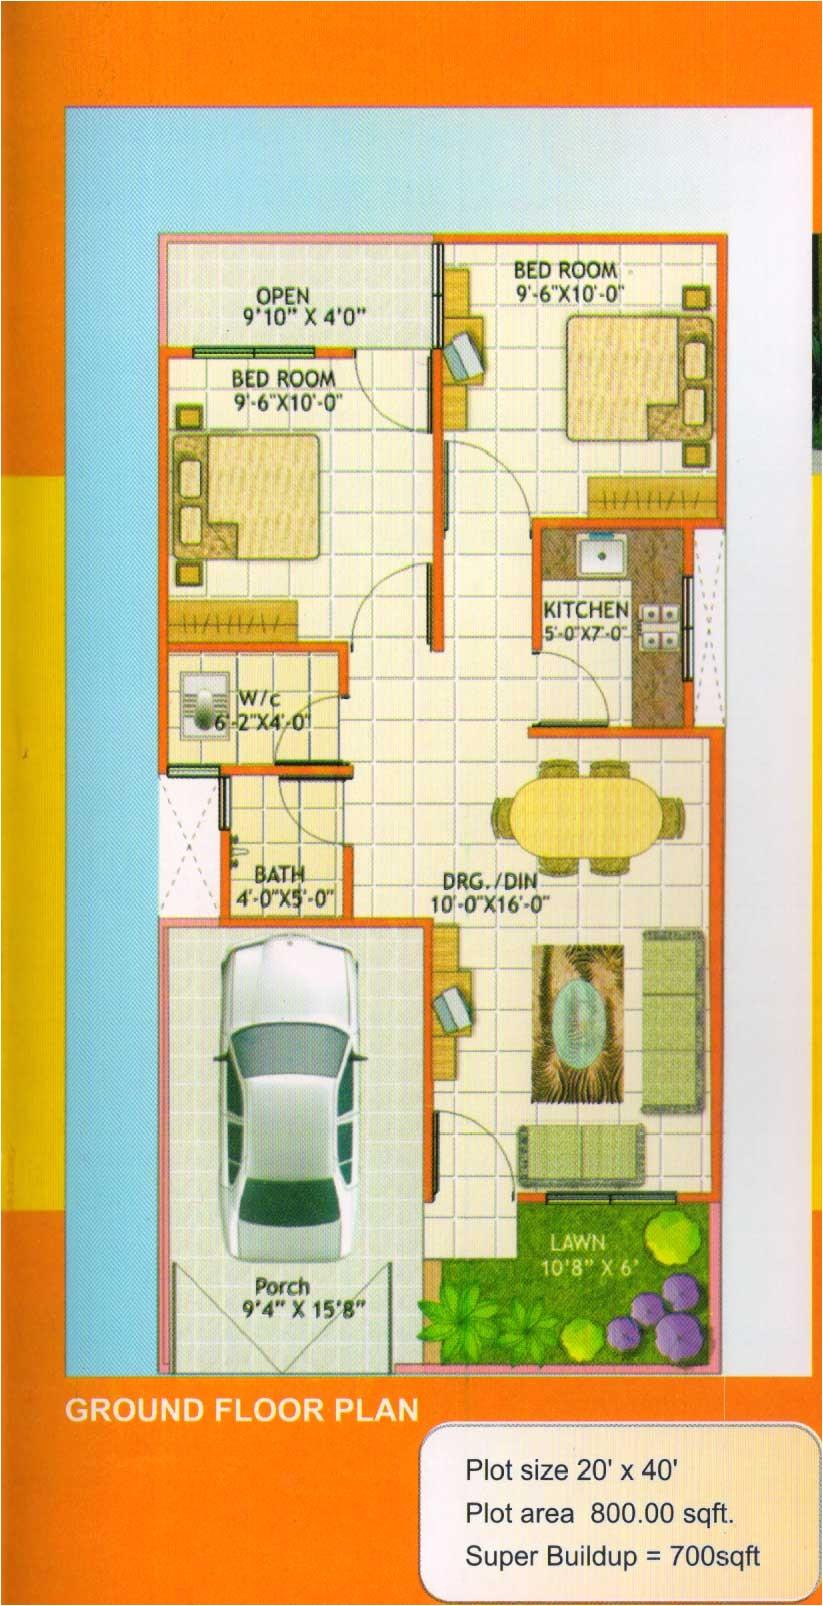 x40 house plans